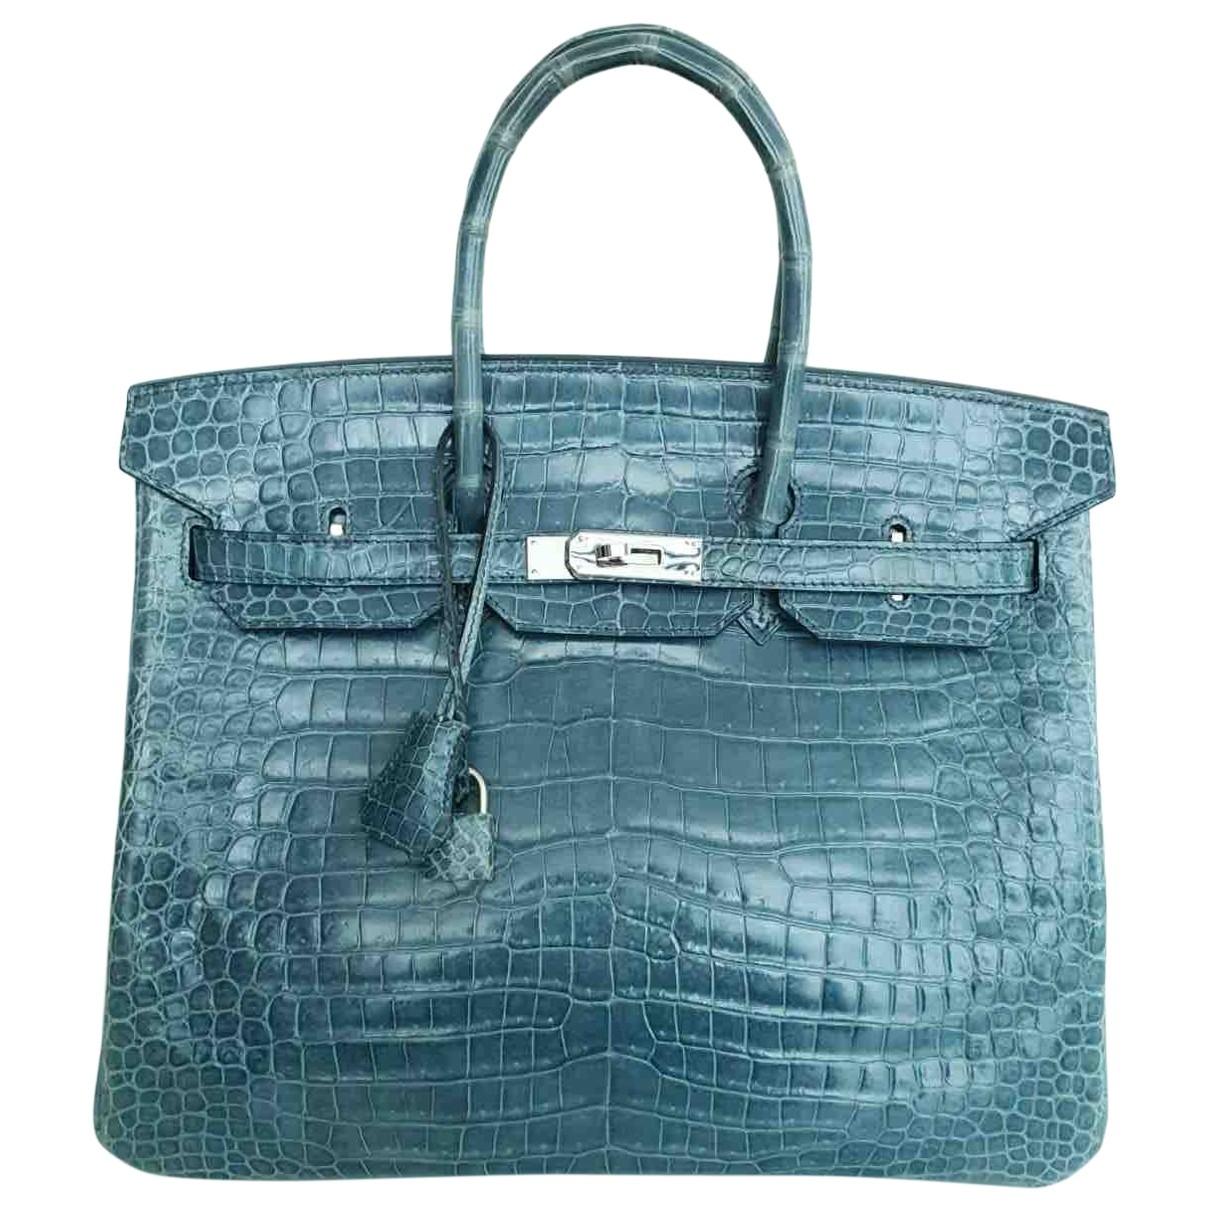 Hermes - Sac a main Birkin 35 pour femme en crocodile - bleu